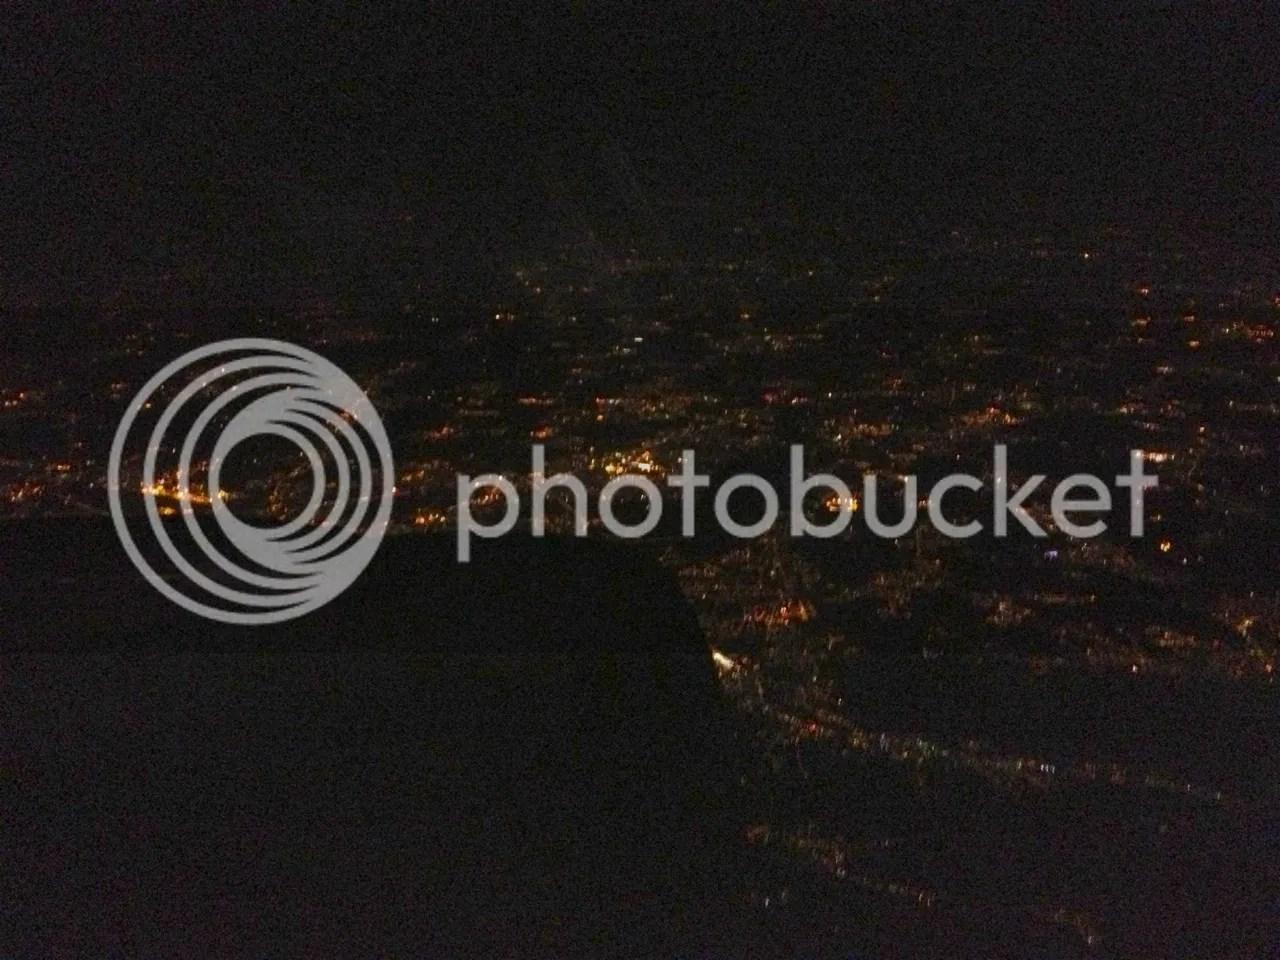 https://i1.wp.com/i181.photobucket.com/albums/x35/jwhite9185/Milan/file-126.jpg